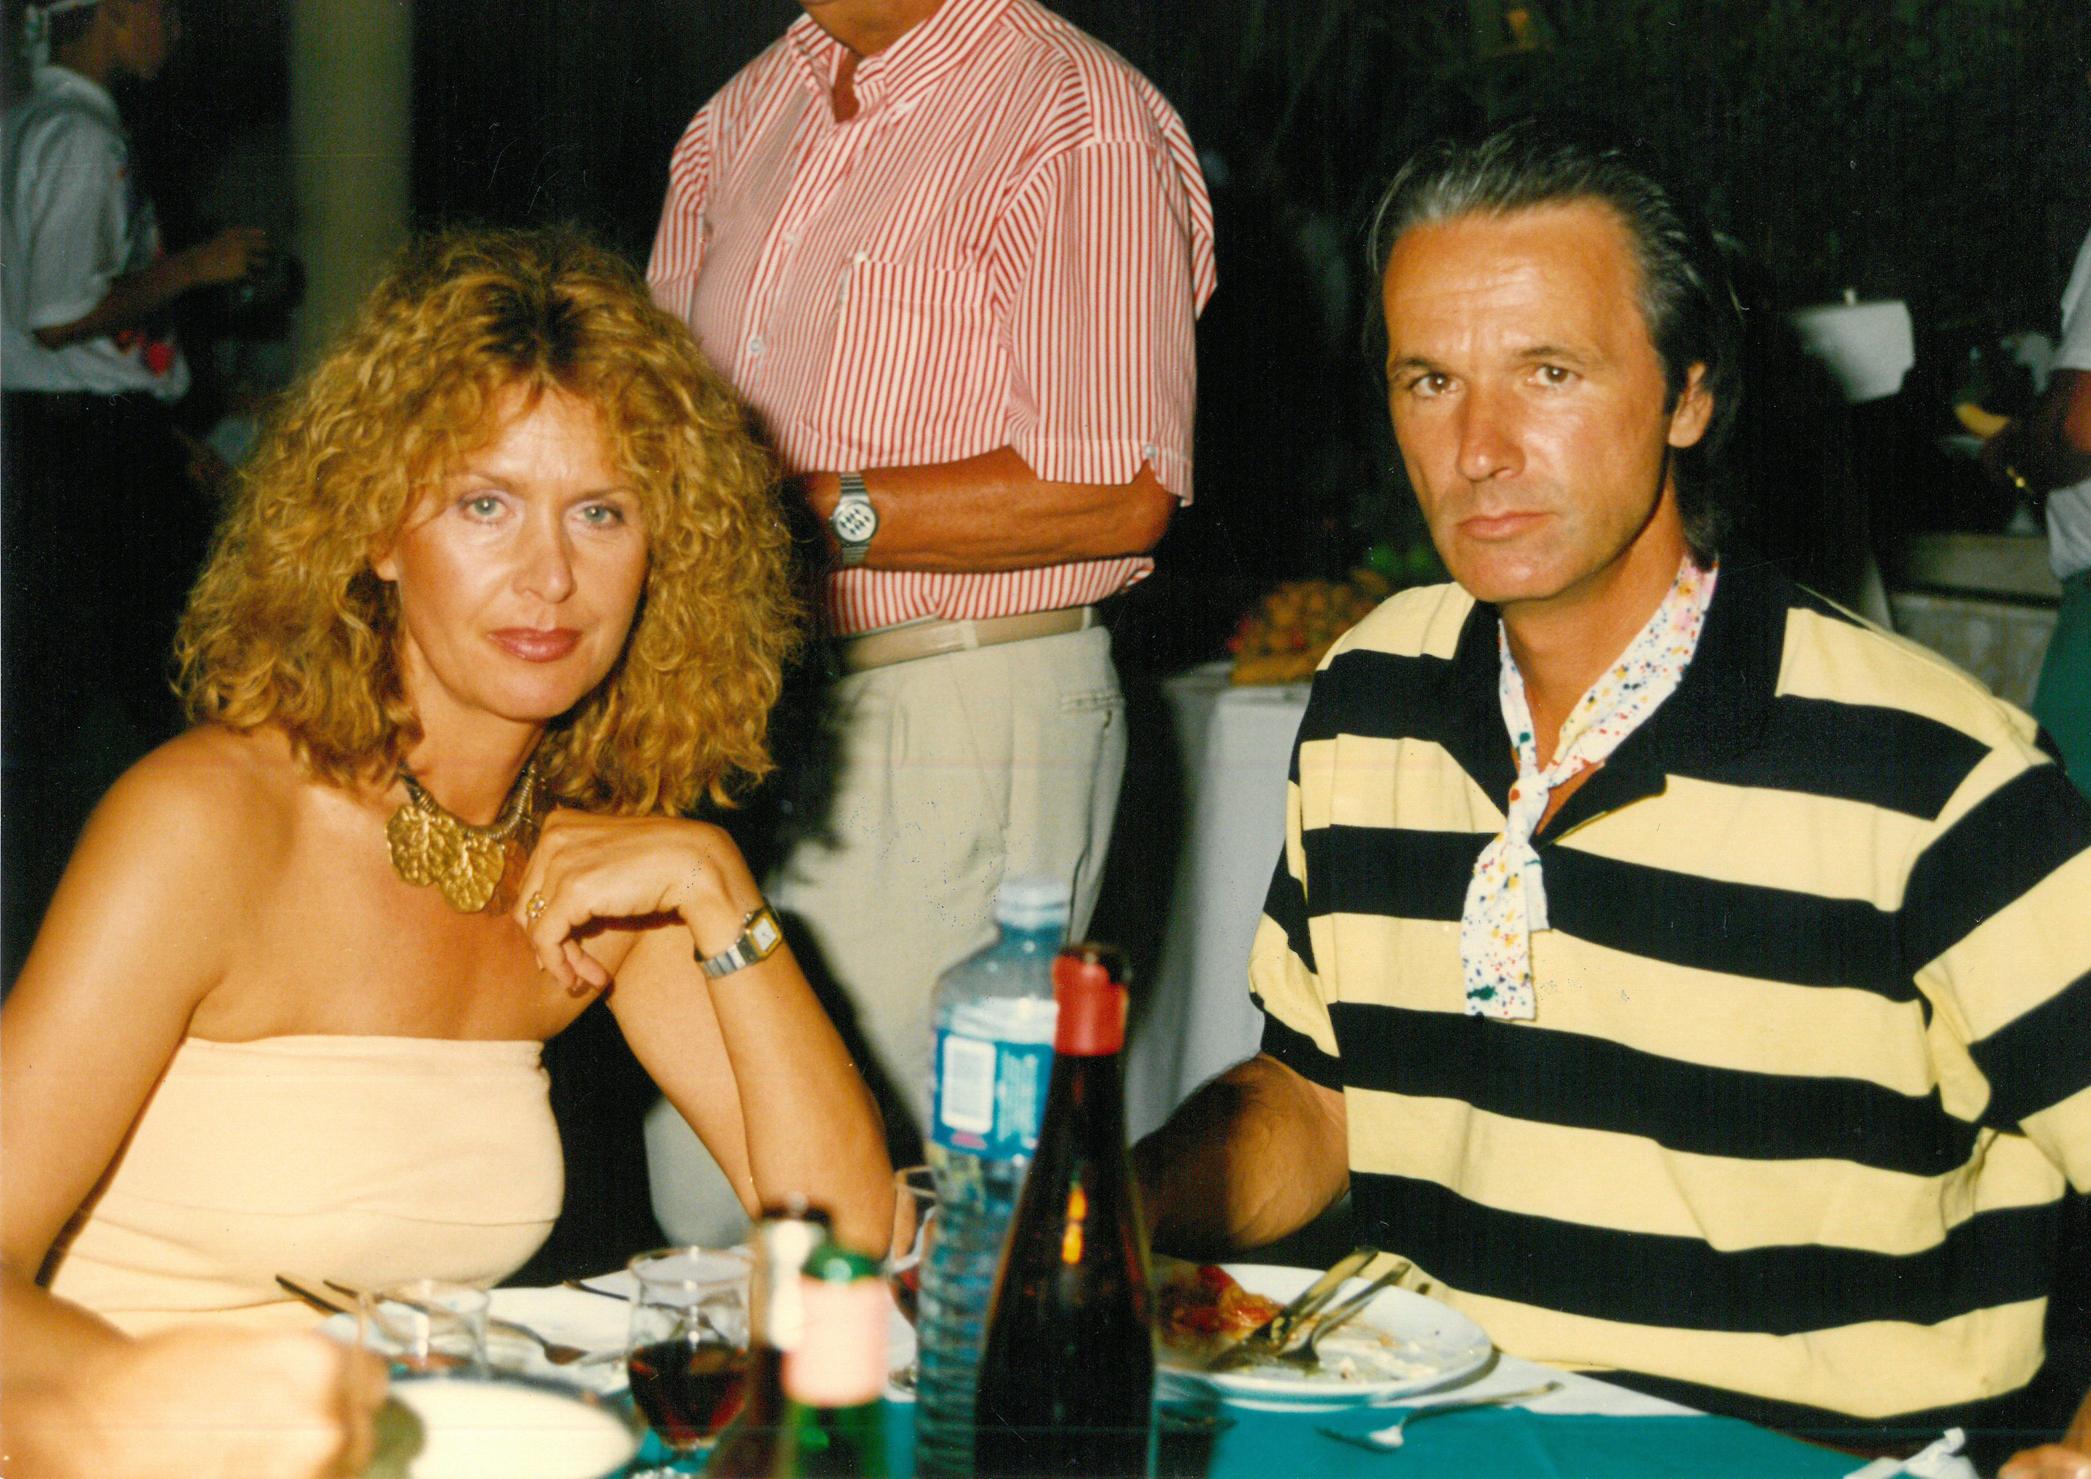 Urlaub auf Korfu